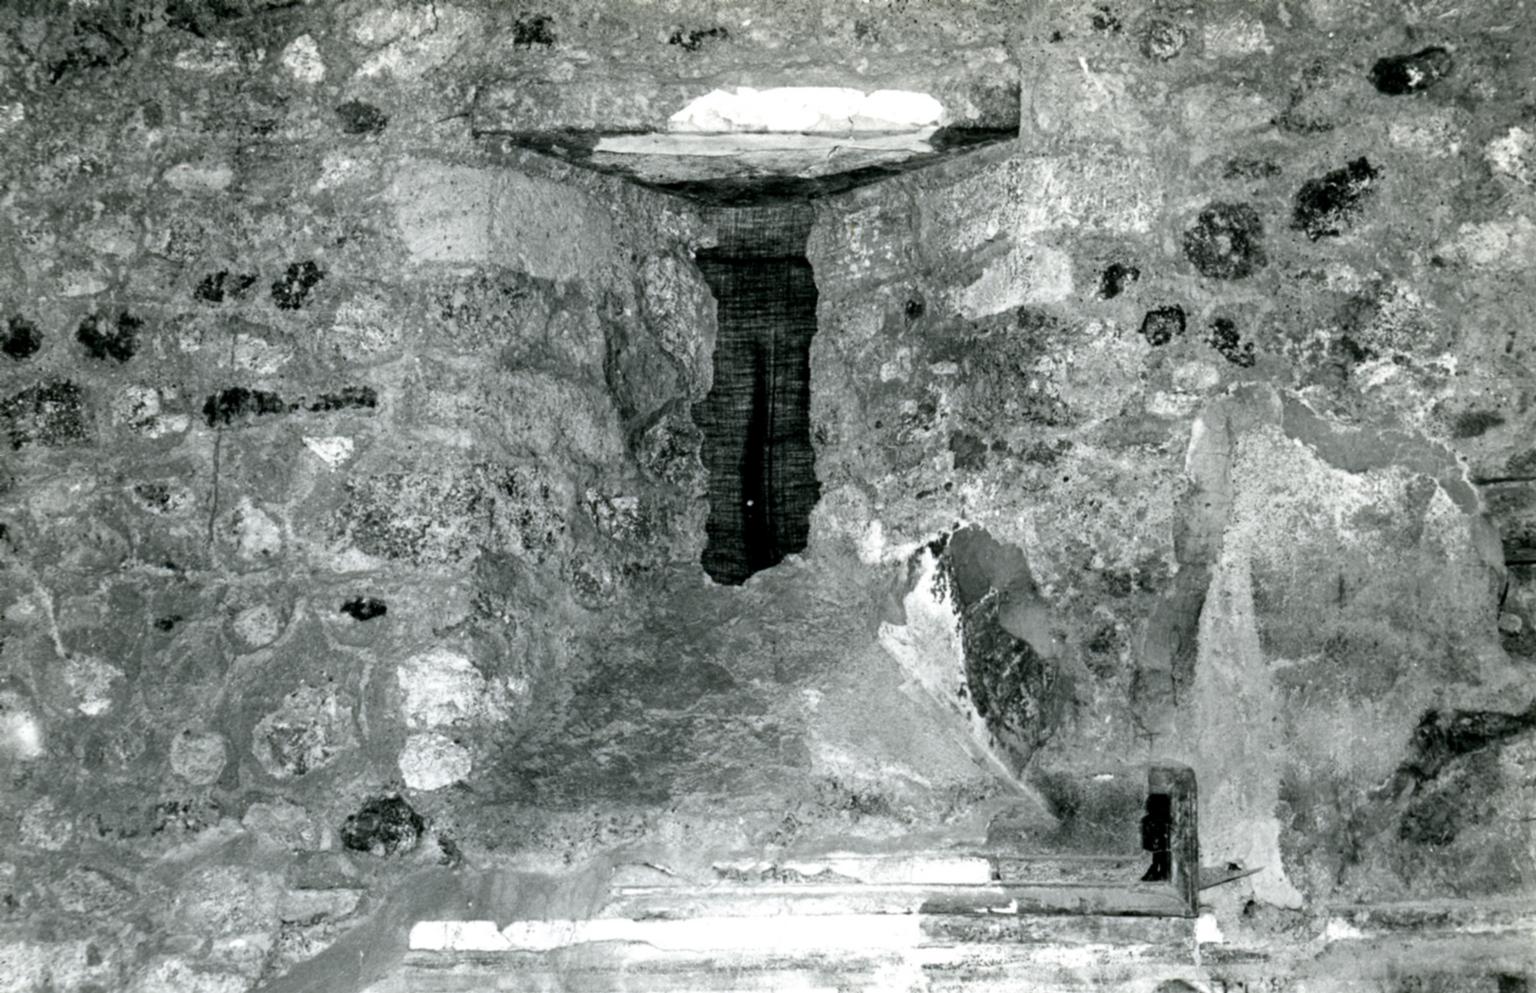 I.8.17 Pompeii. 1972. Room 9. Casa dei Quattro Stili, pillared oecus,S wall, window.  Photo courtesy of Anne Laidlaw. American Academy in Rome, Photographic Archive. Laidlaw collection _P_72_15_2.